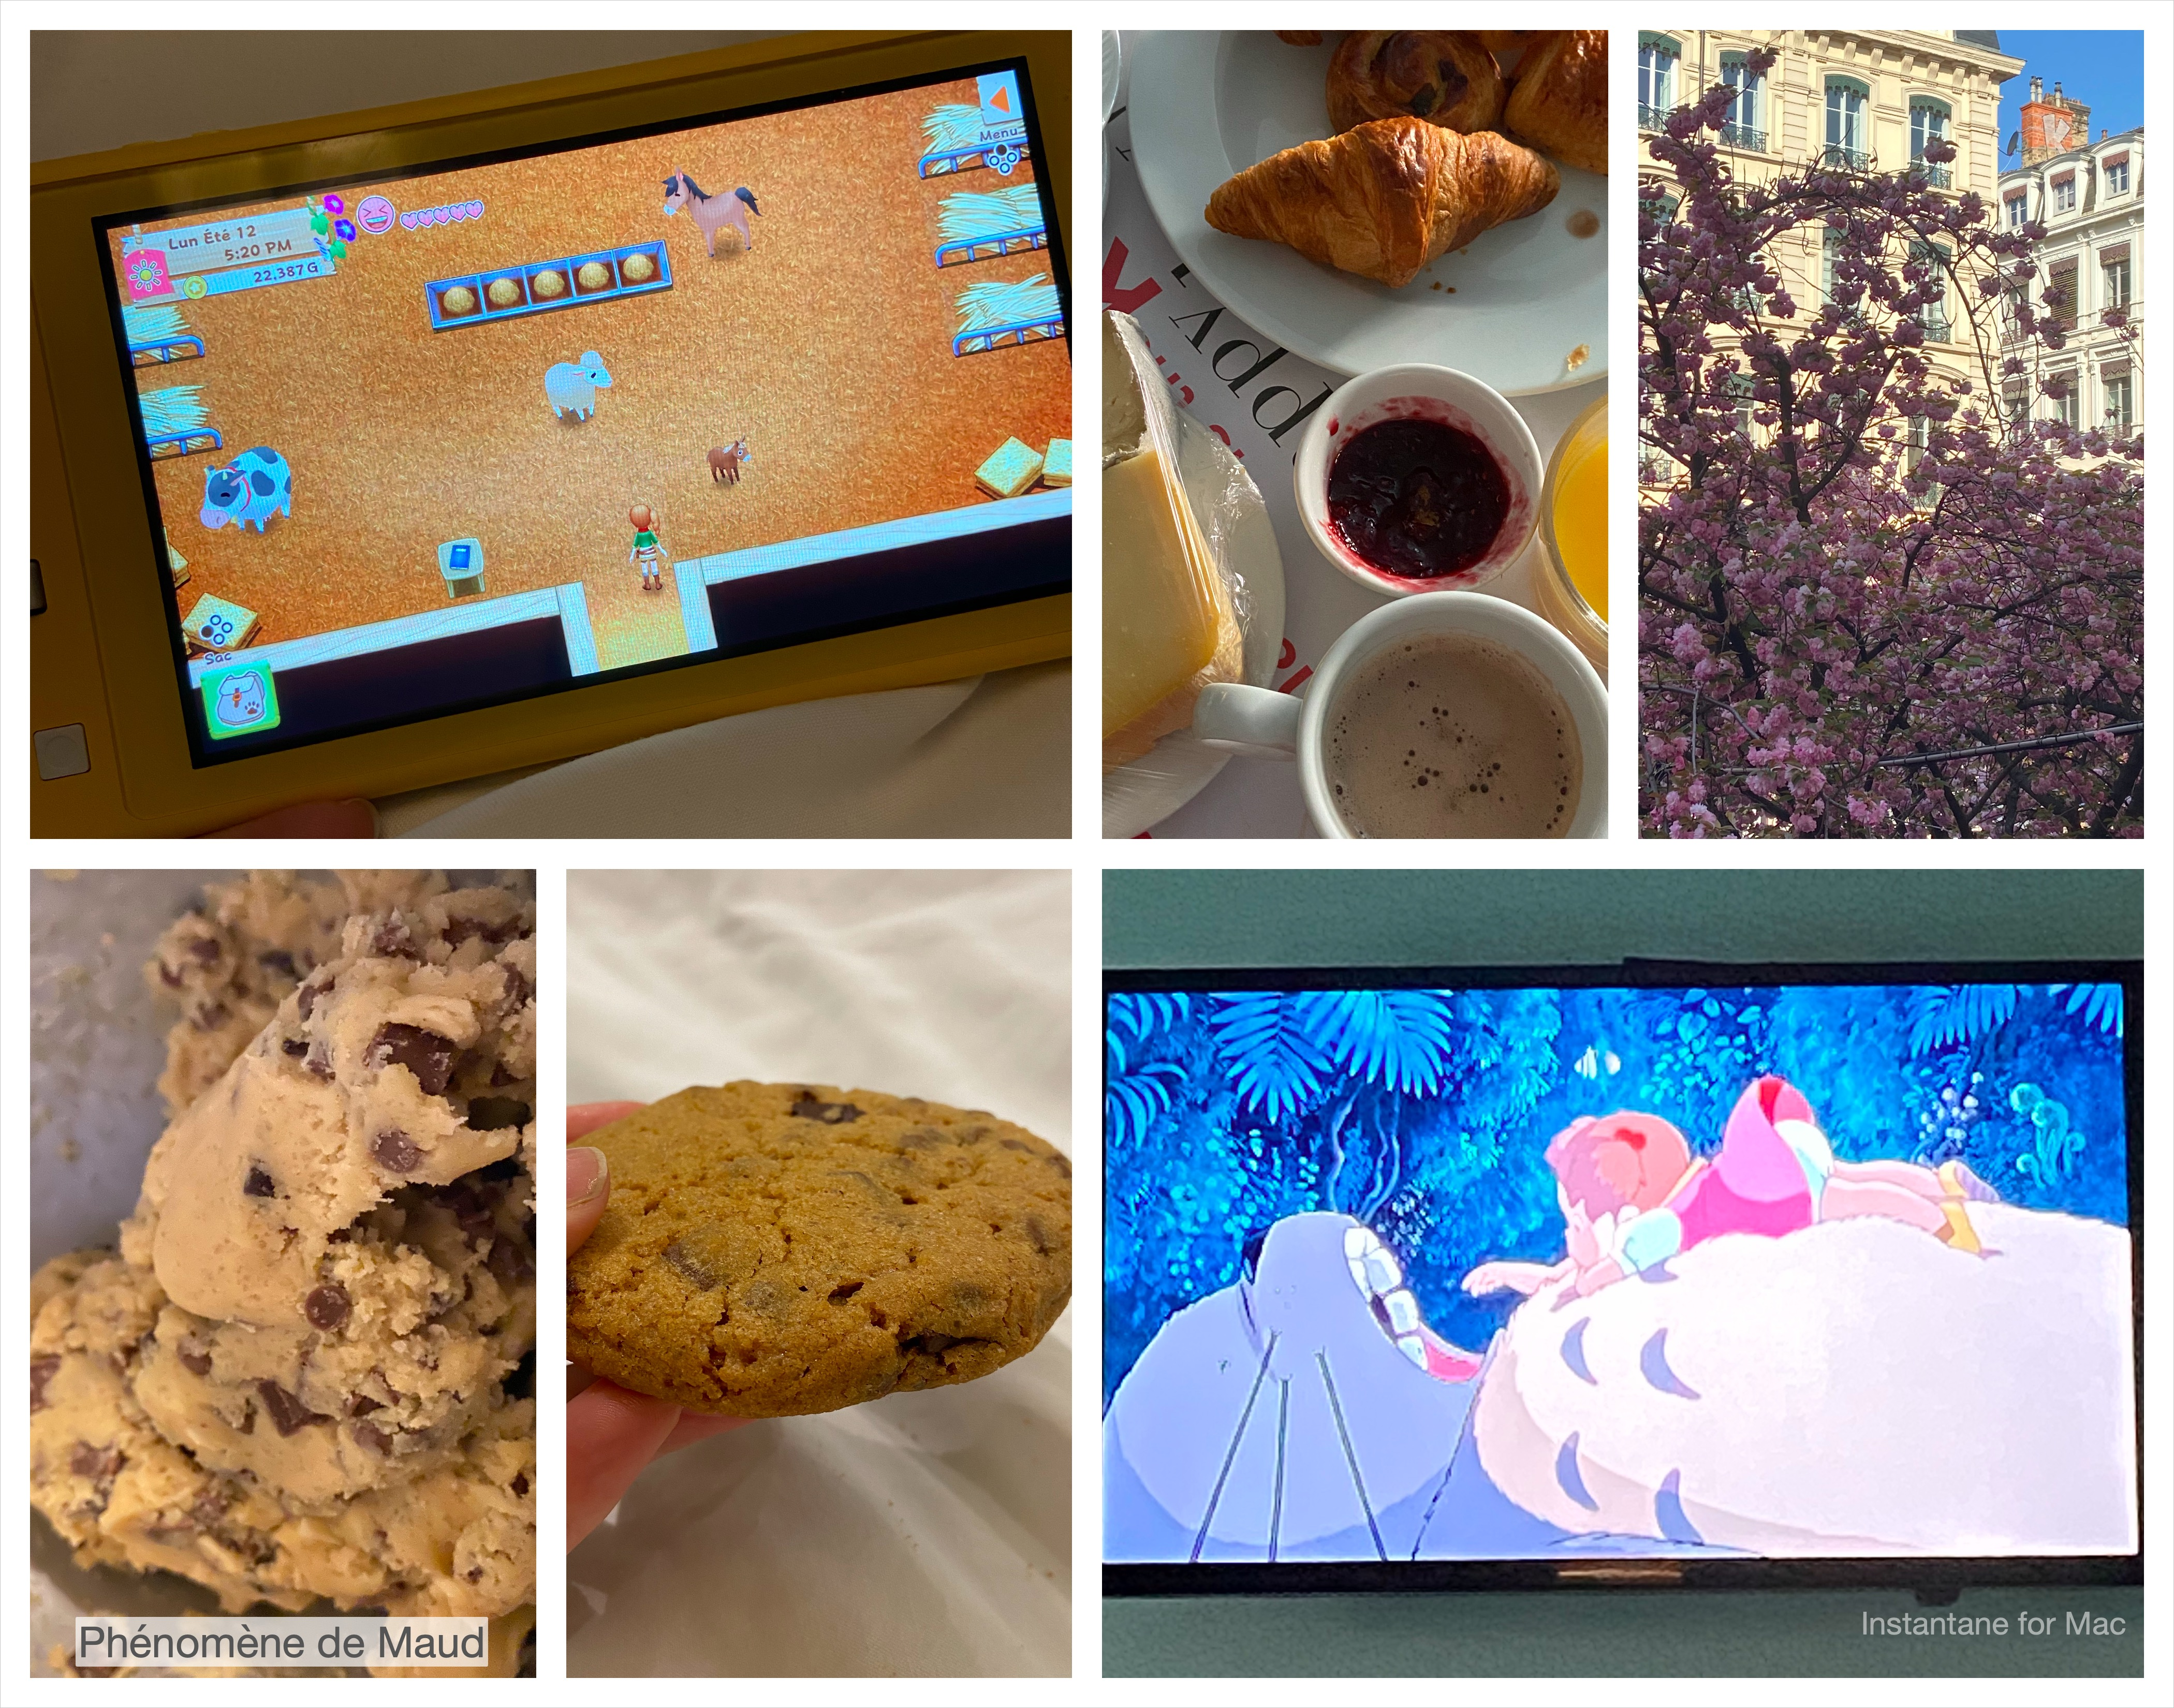 jeudi 2 avil console petit dejeuner lyon cookies studios ghibli